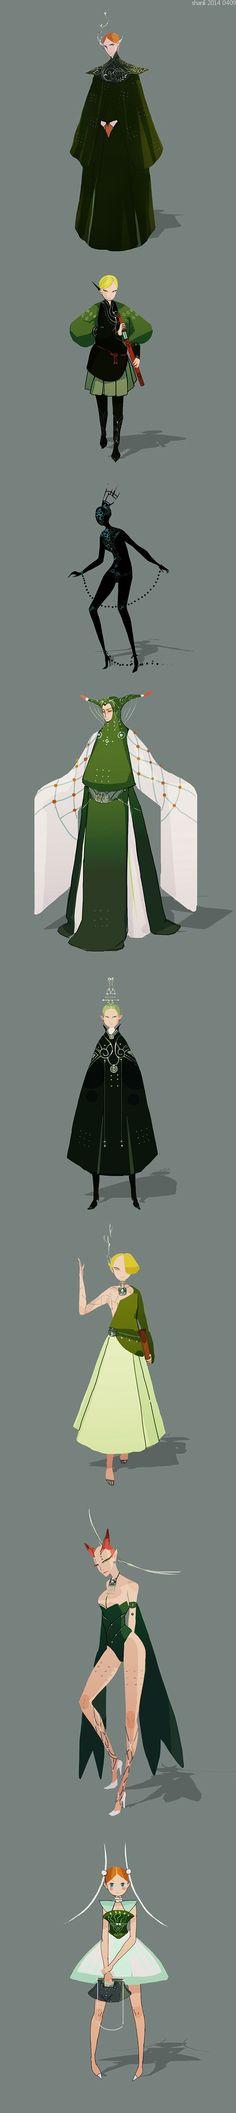 shanli by yao yao, via Behance: